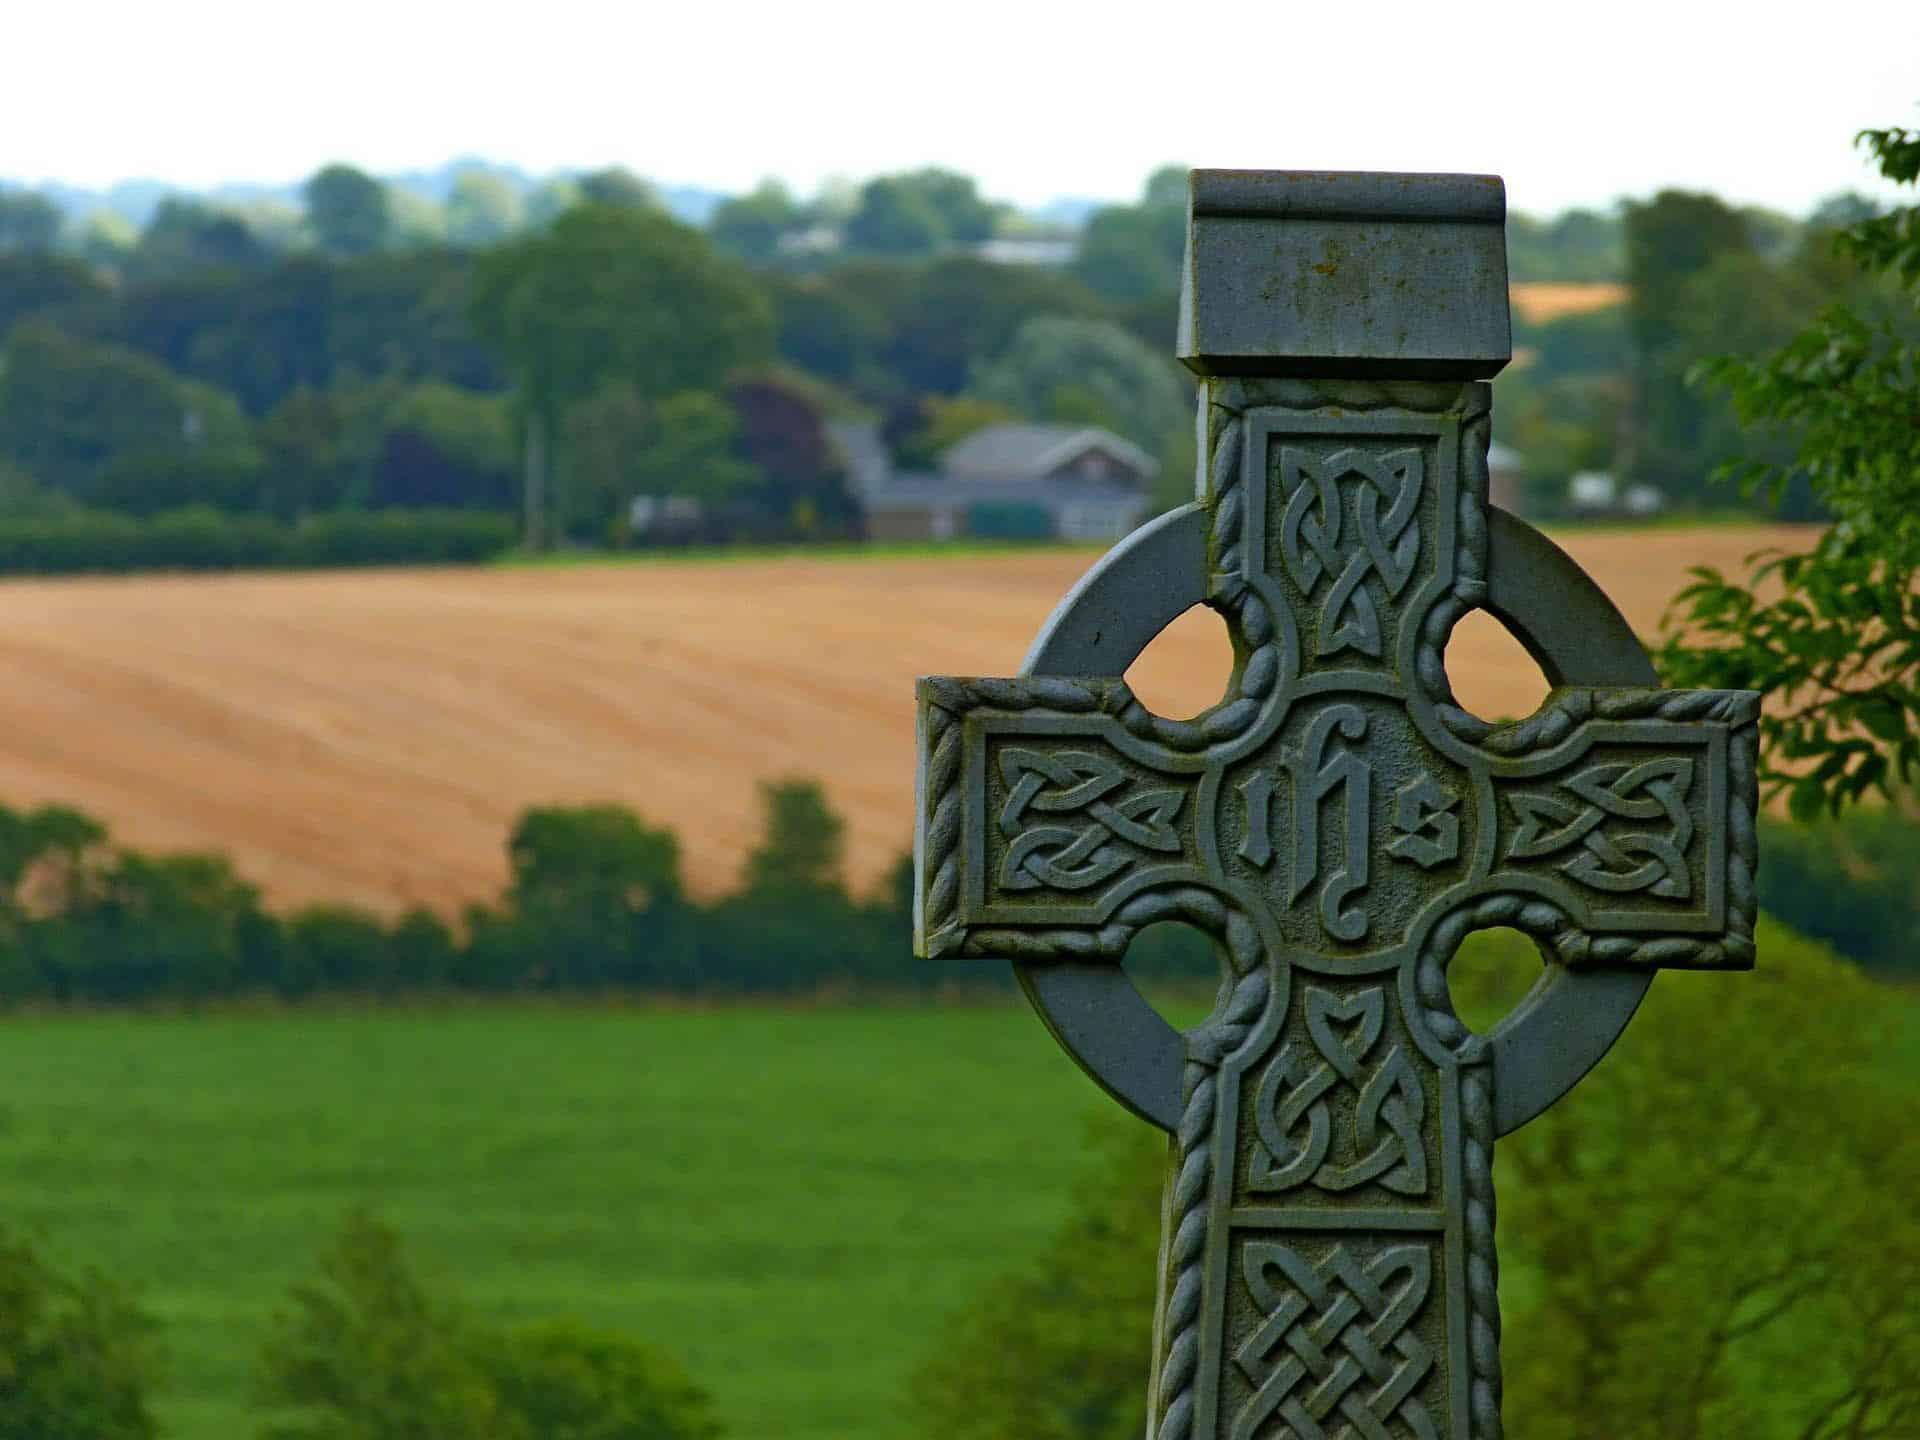 dioses celtas galicia